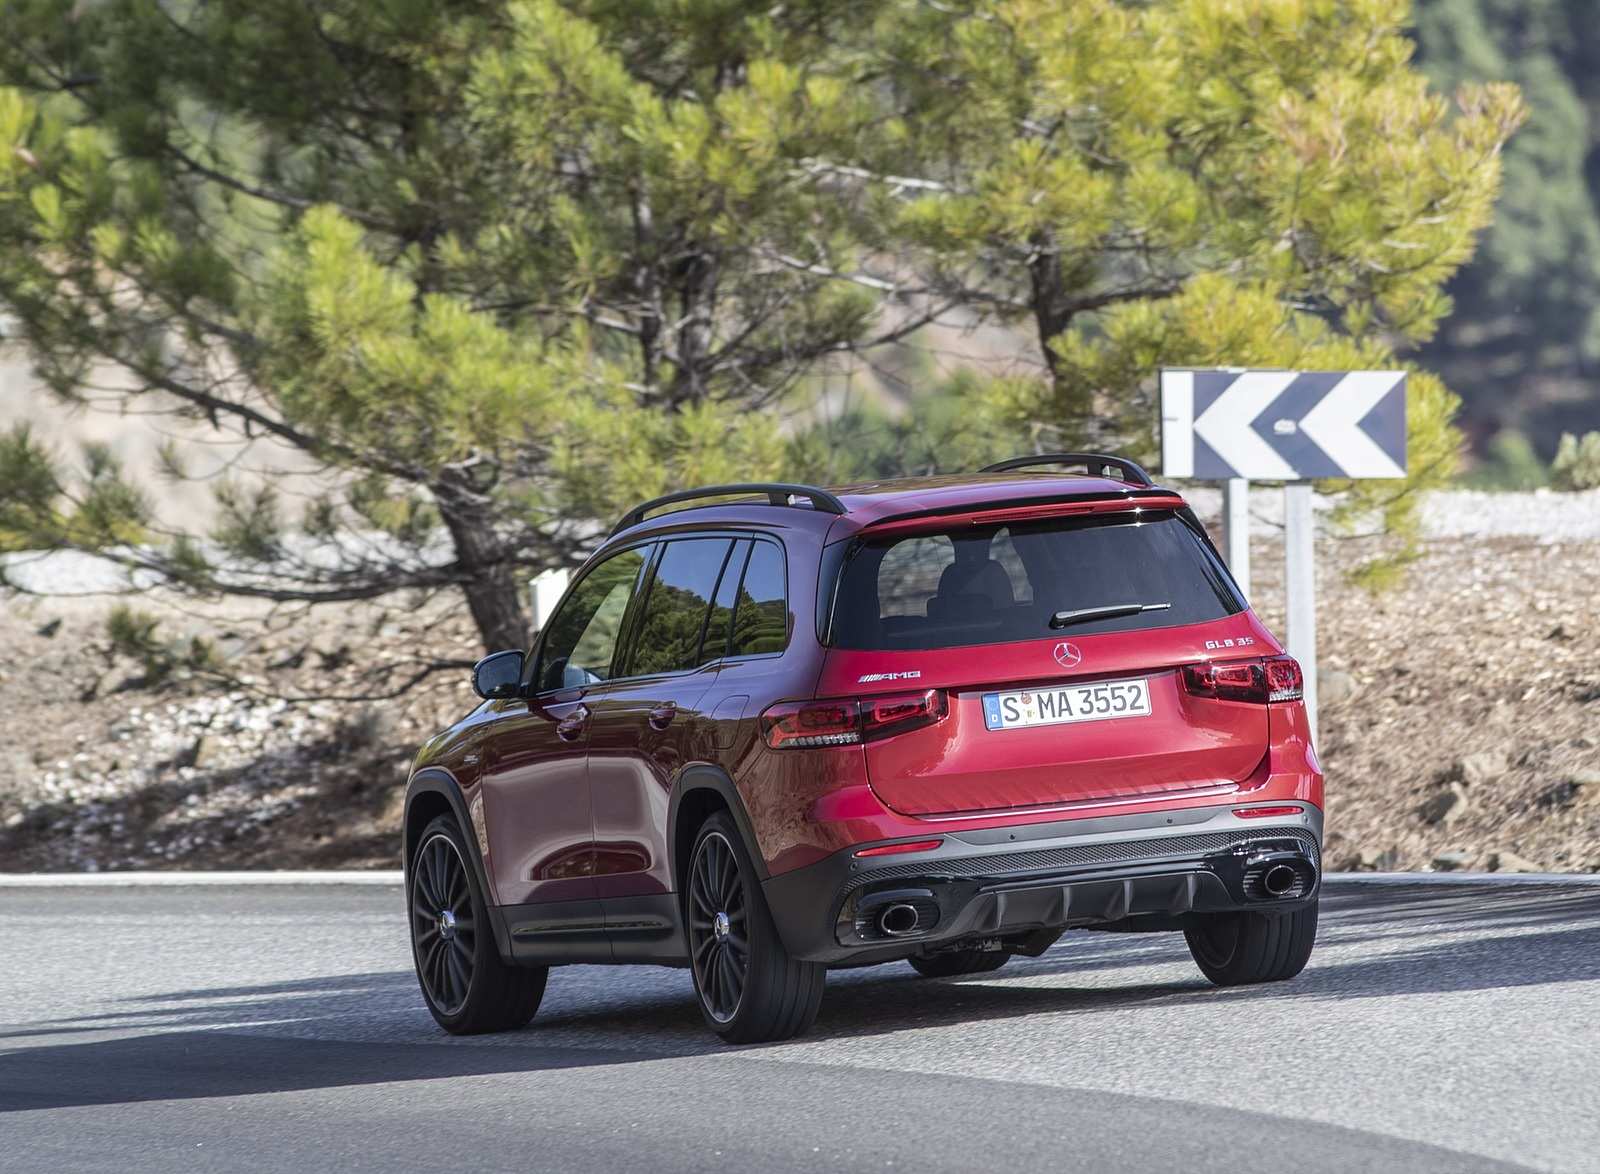 2021 Mercedes-AMG GLB 35 4MATIC (Color: Designo Patagonia Red Metallic) Rear Three-Quarter Wallpapers (7)